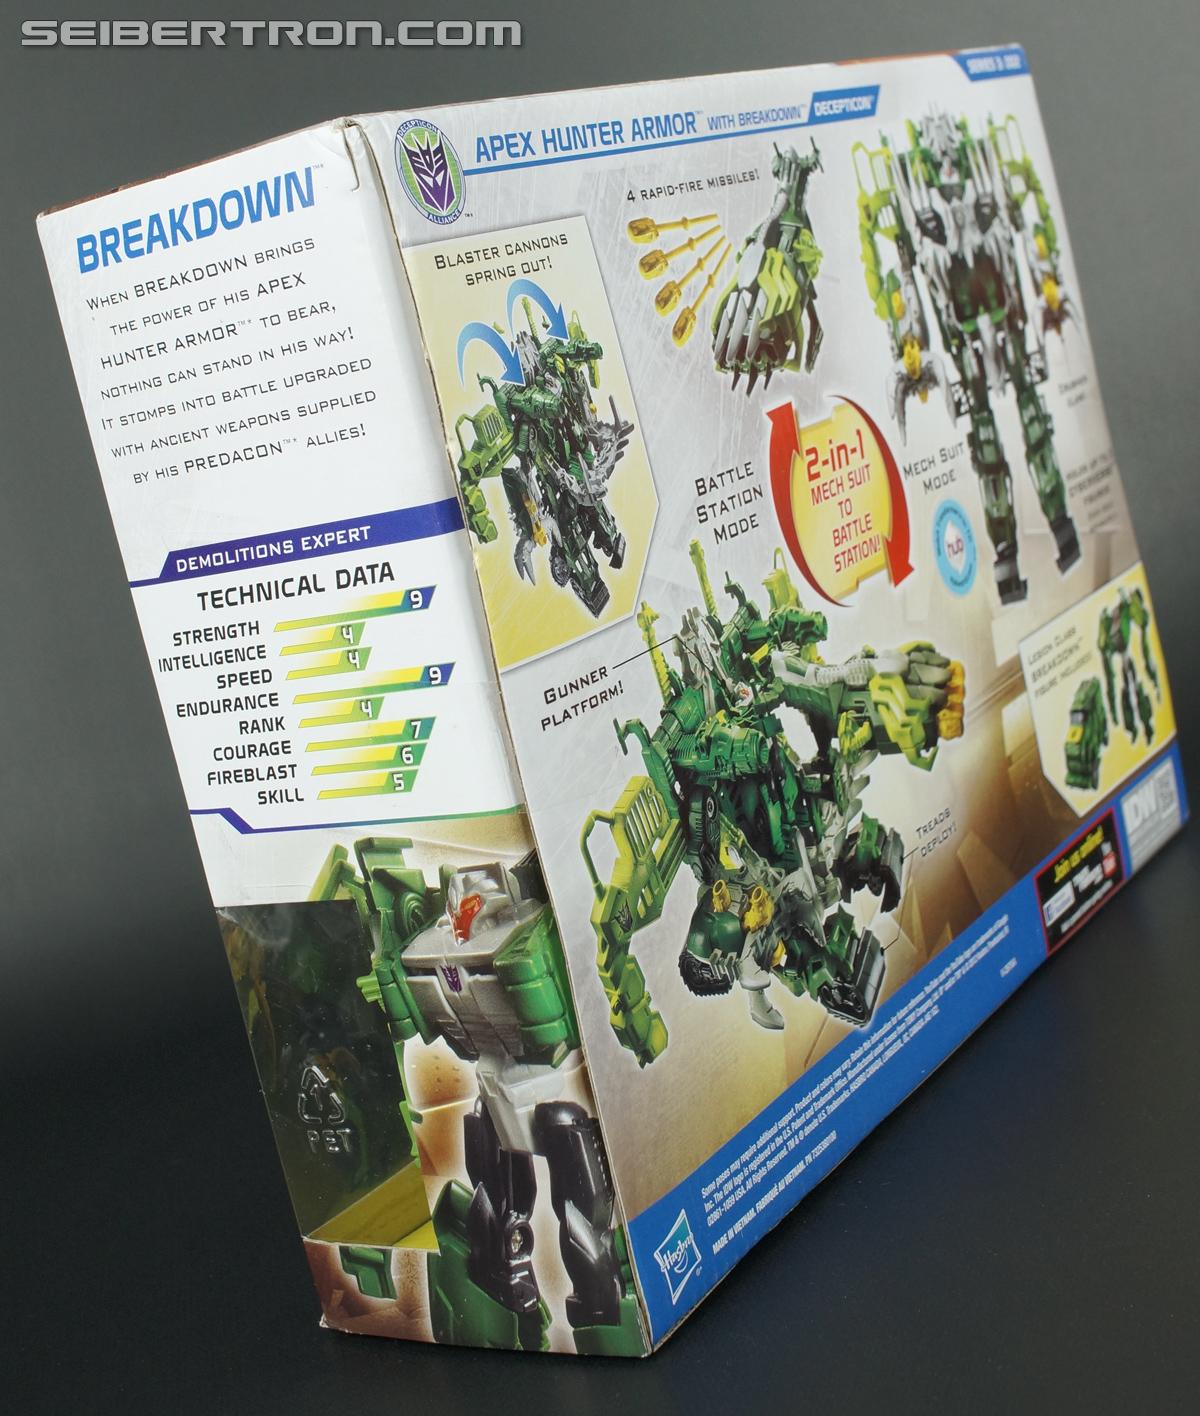 Transformers Prime Beast Hunters Cyberverse Apex Hunter Armor (Image #9 of 96)